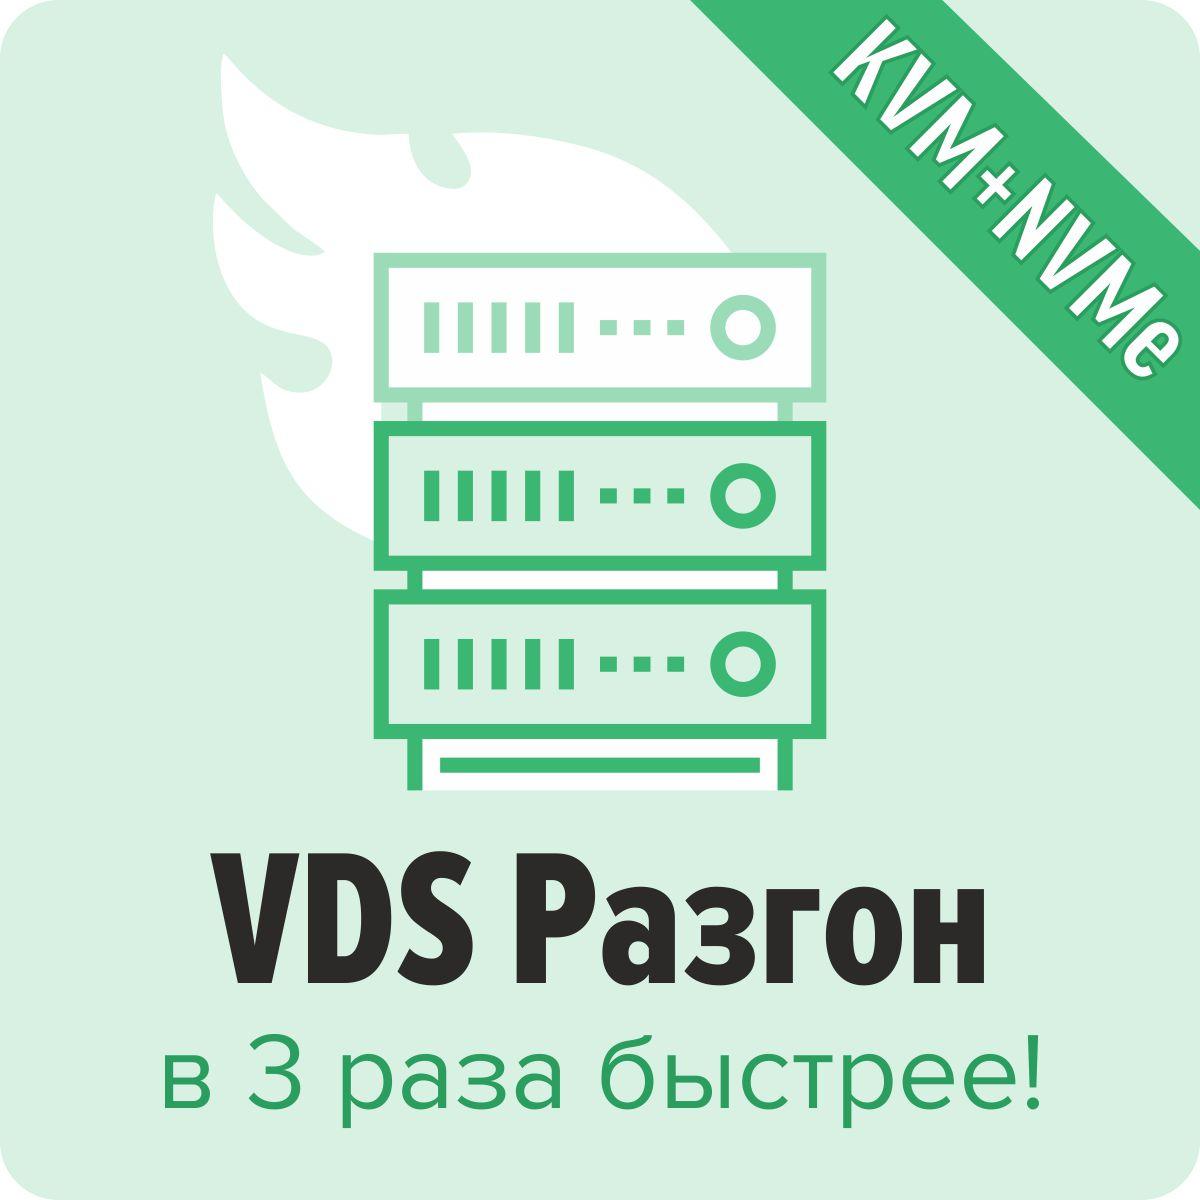 VDS Разгон (KVM, NVMe, 2 Core, 2Gb RAM, 40Gb NVMe)